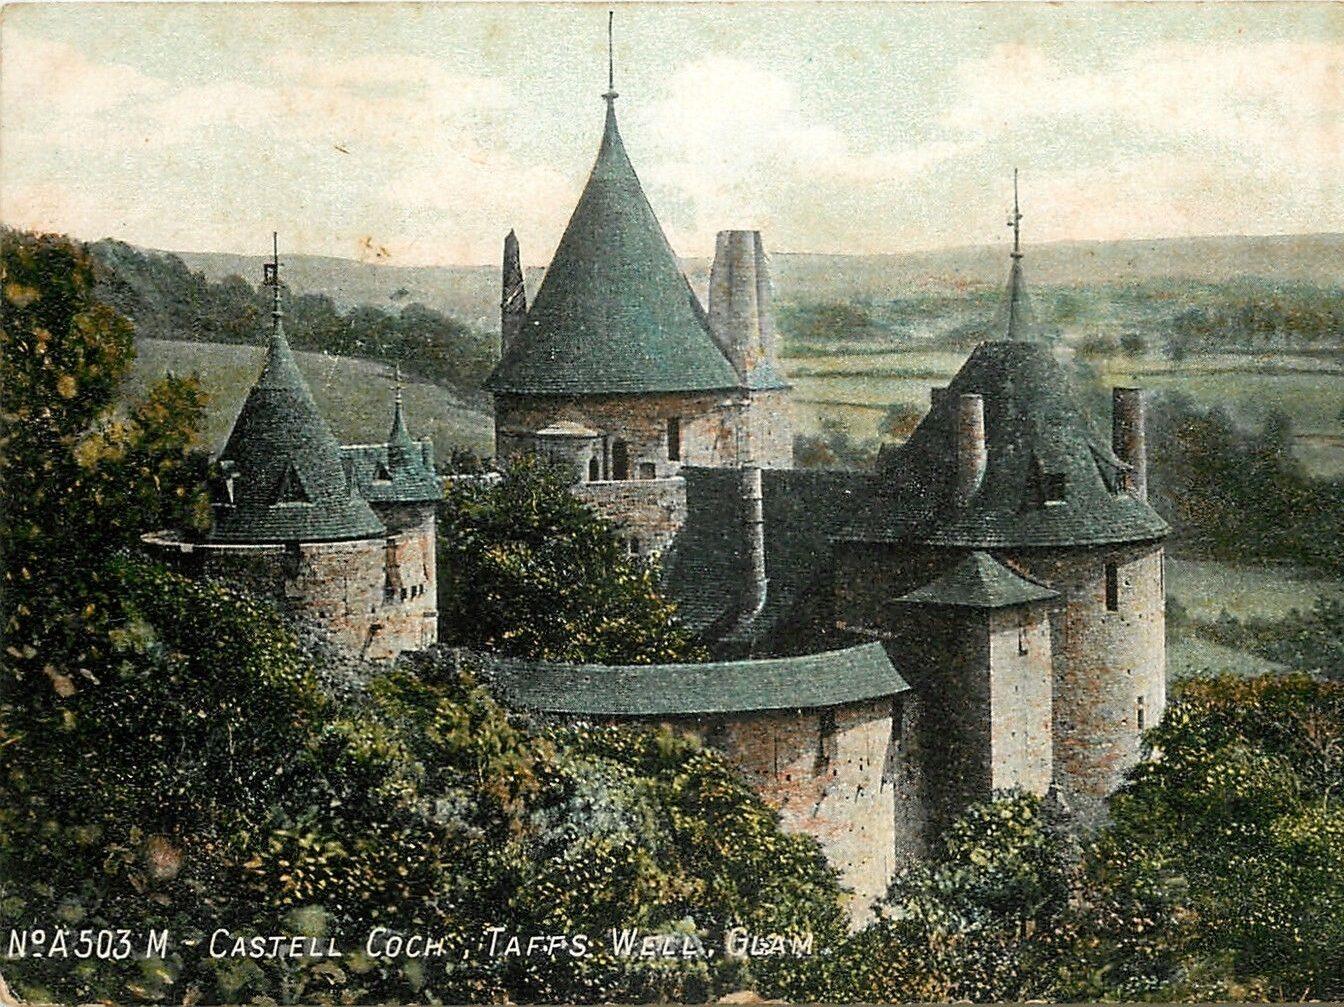 Postcard featuring Castell Coch